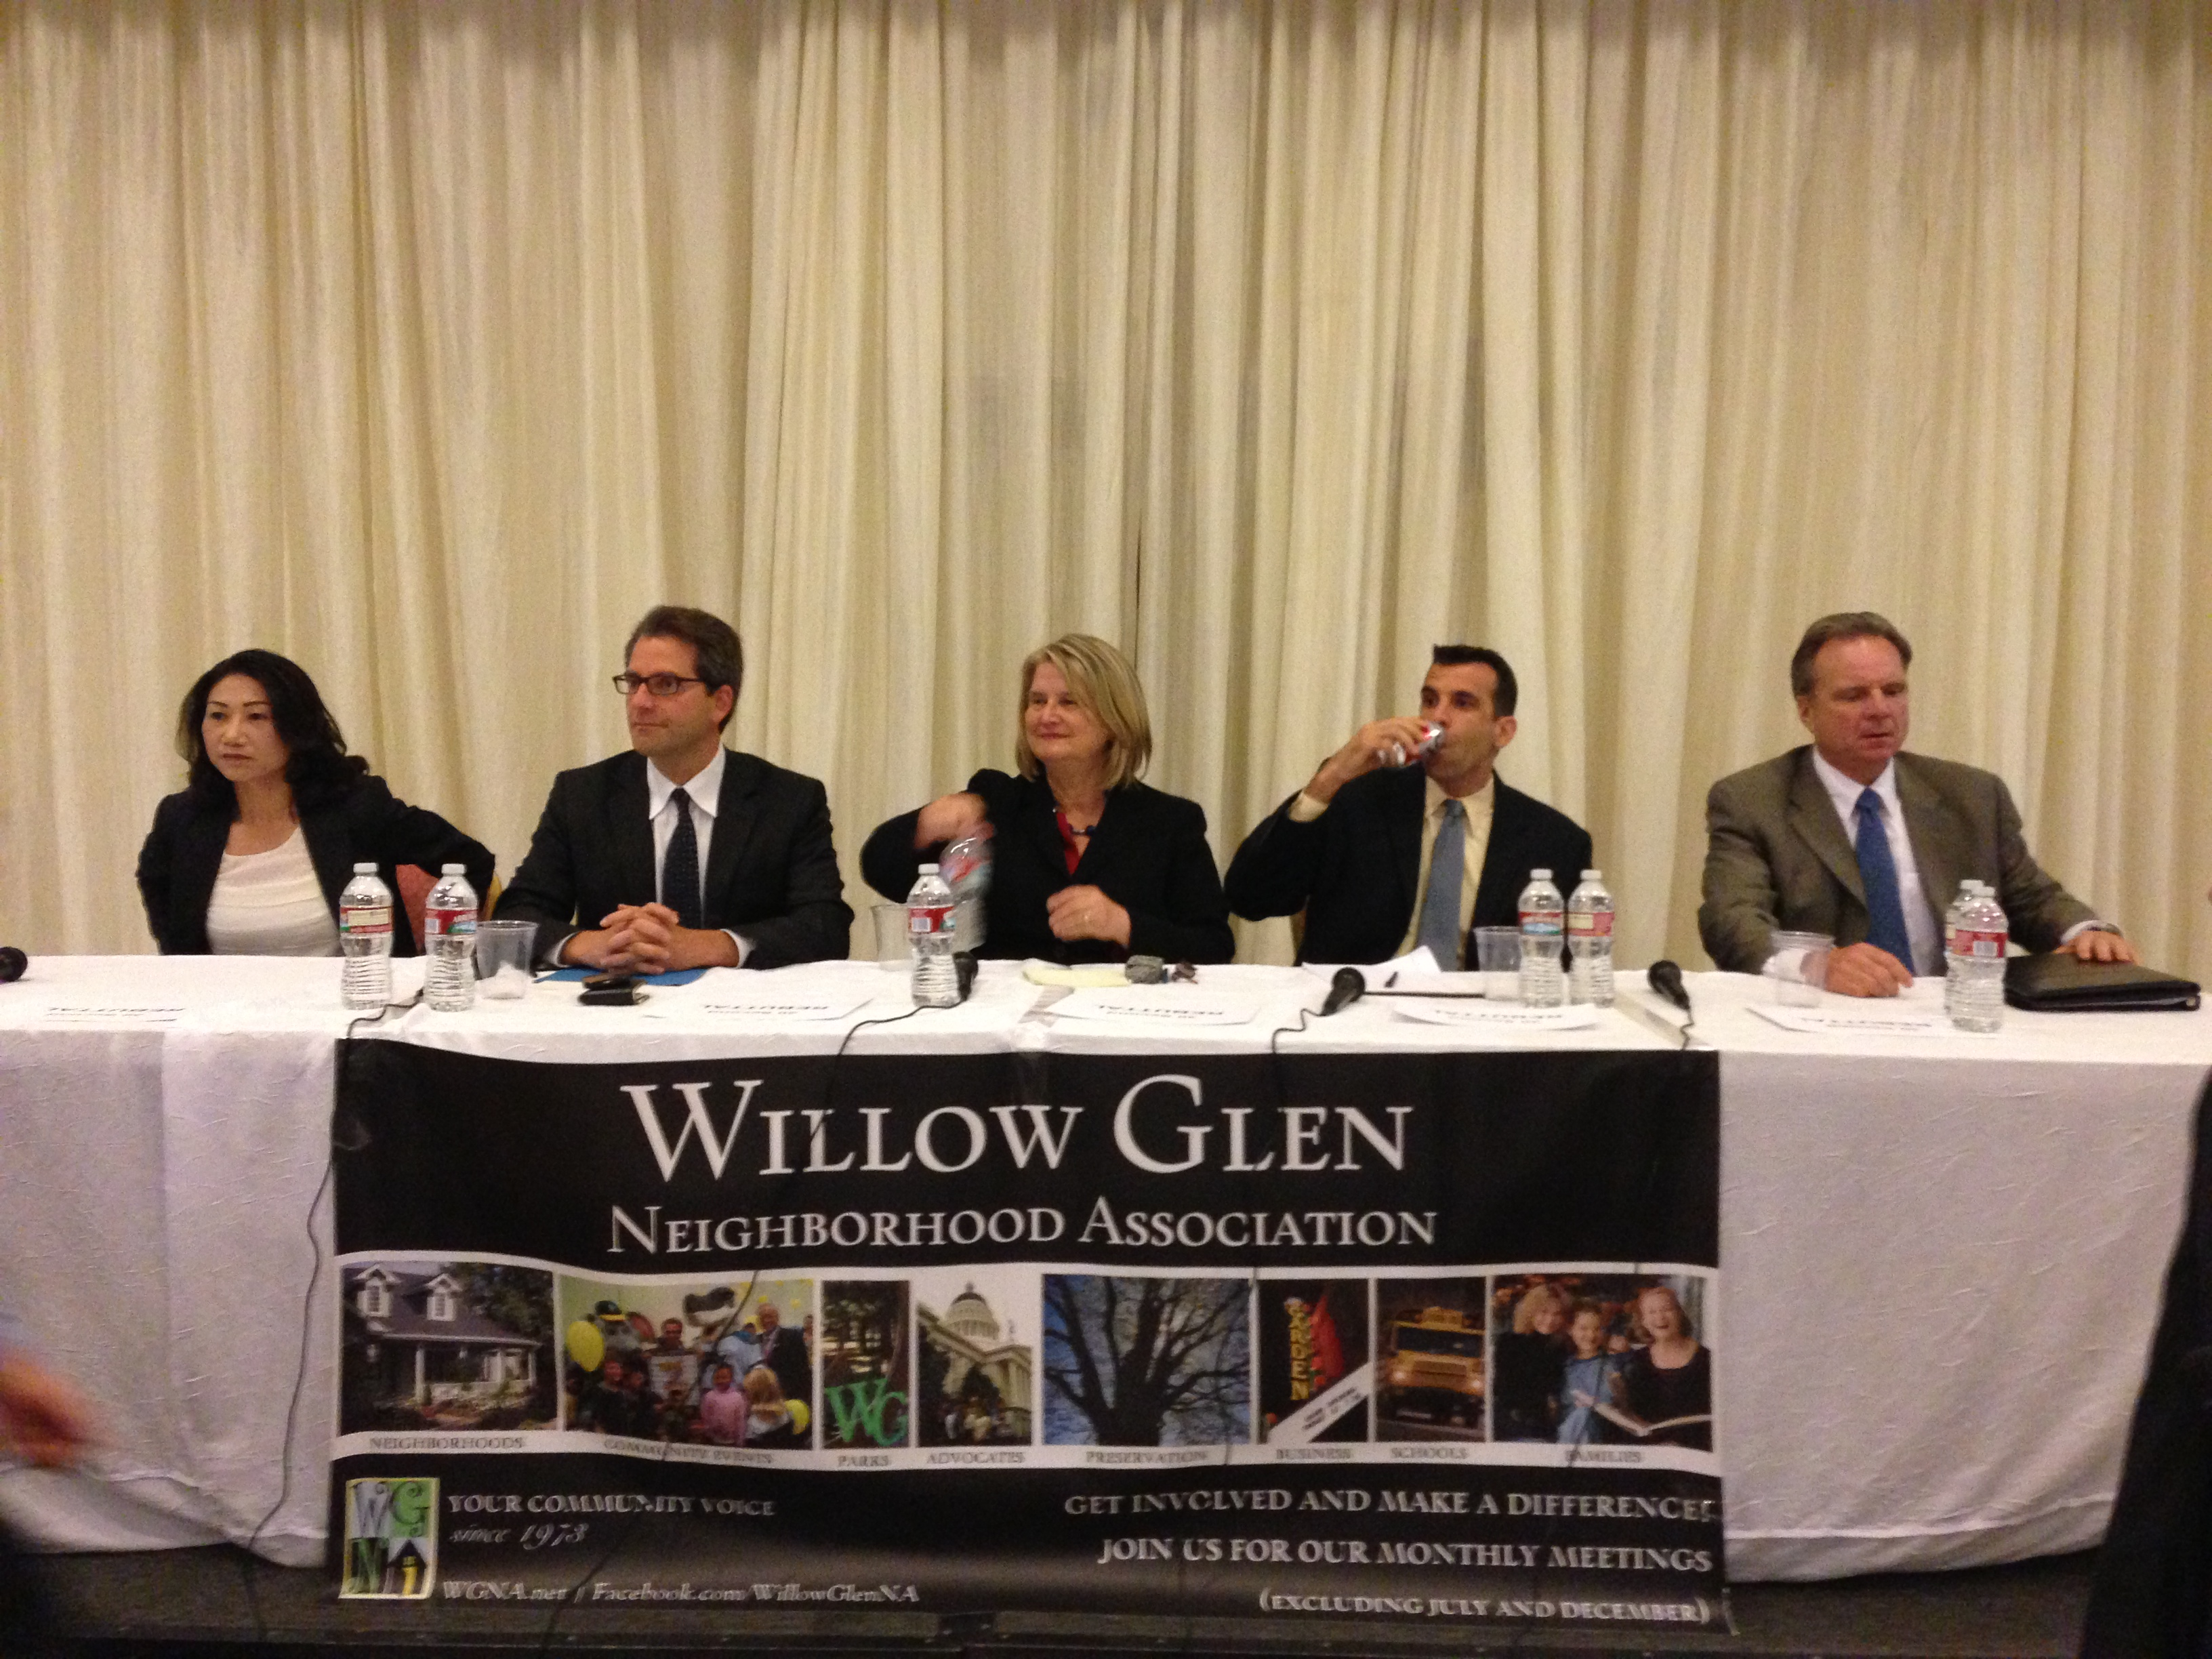 Candidates for San Jose Mayor, from left to right: Madison Nguyen, Pierluigi Oliverio, Rose Herrera, Sam Liccardo, and Santa Clara Supervisor Dave Cortese. (Cy Musiker/KWQED)